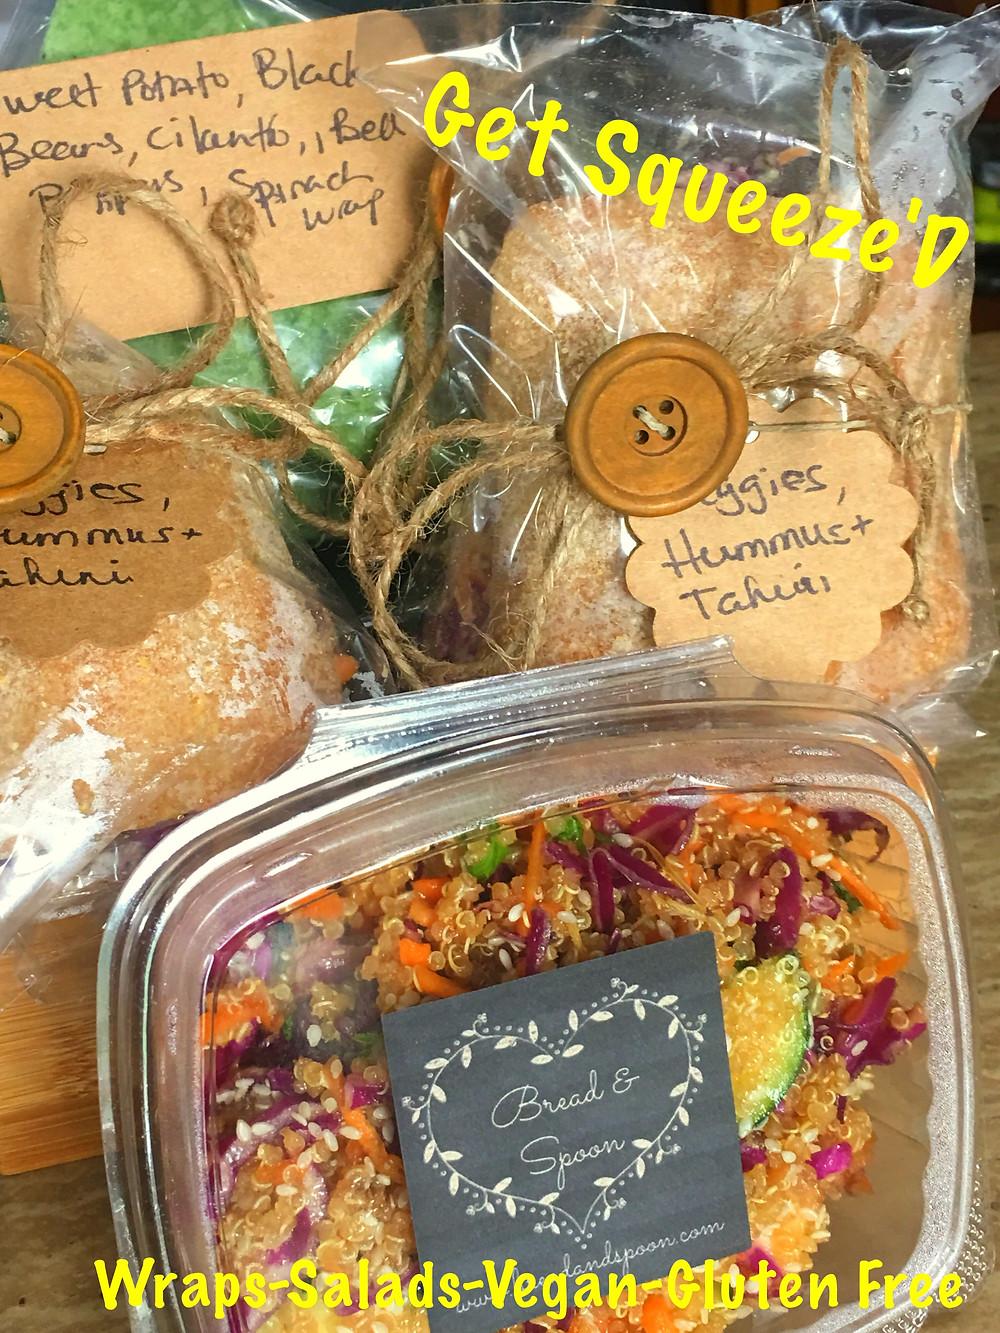 Veggie Hummus Tahini Wrap, Salad